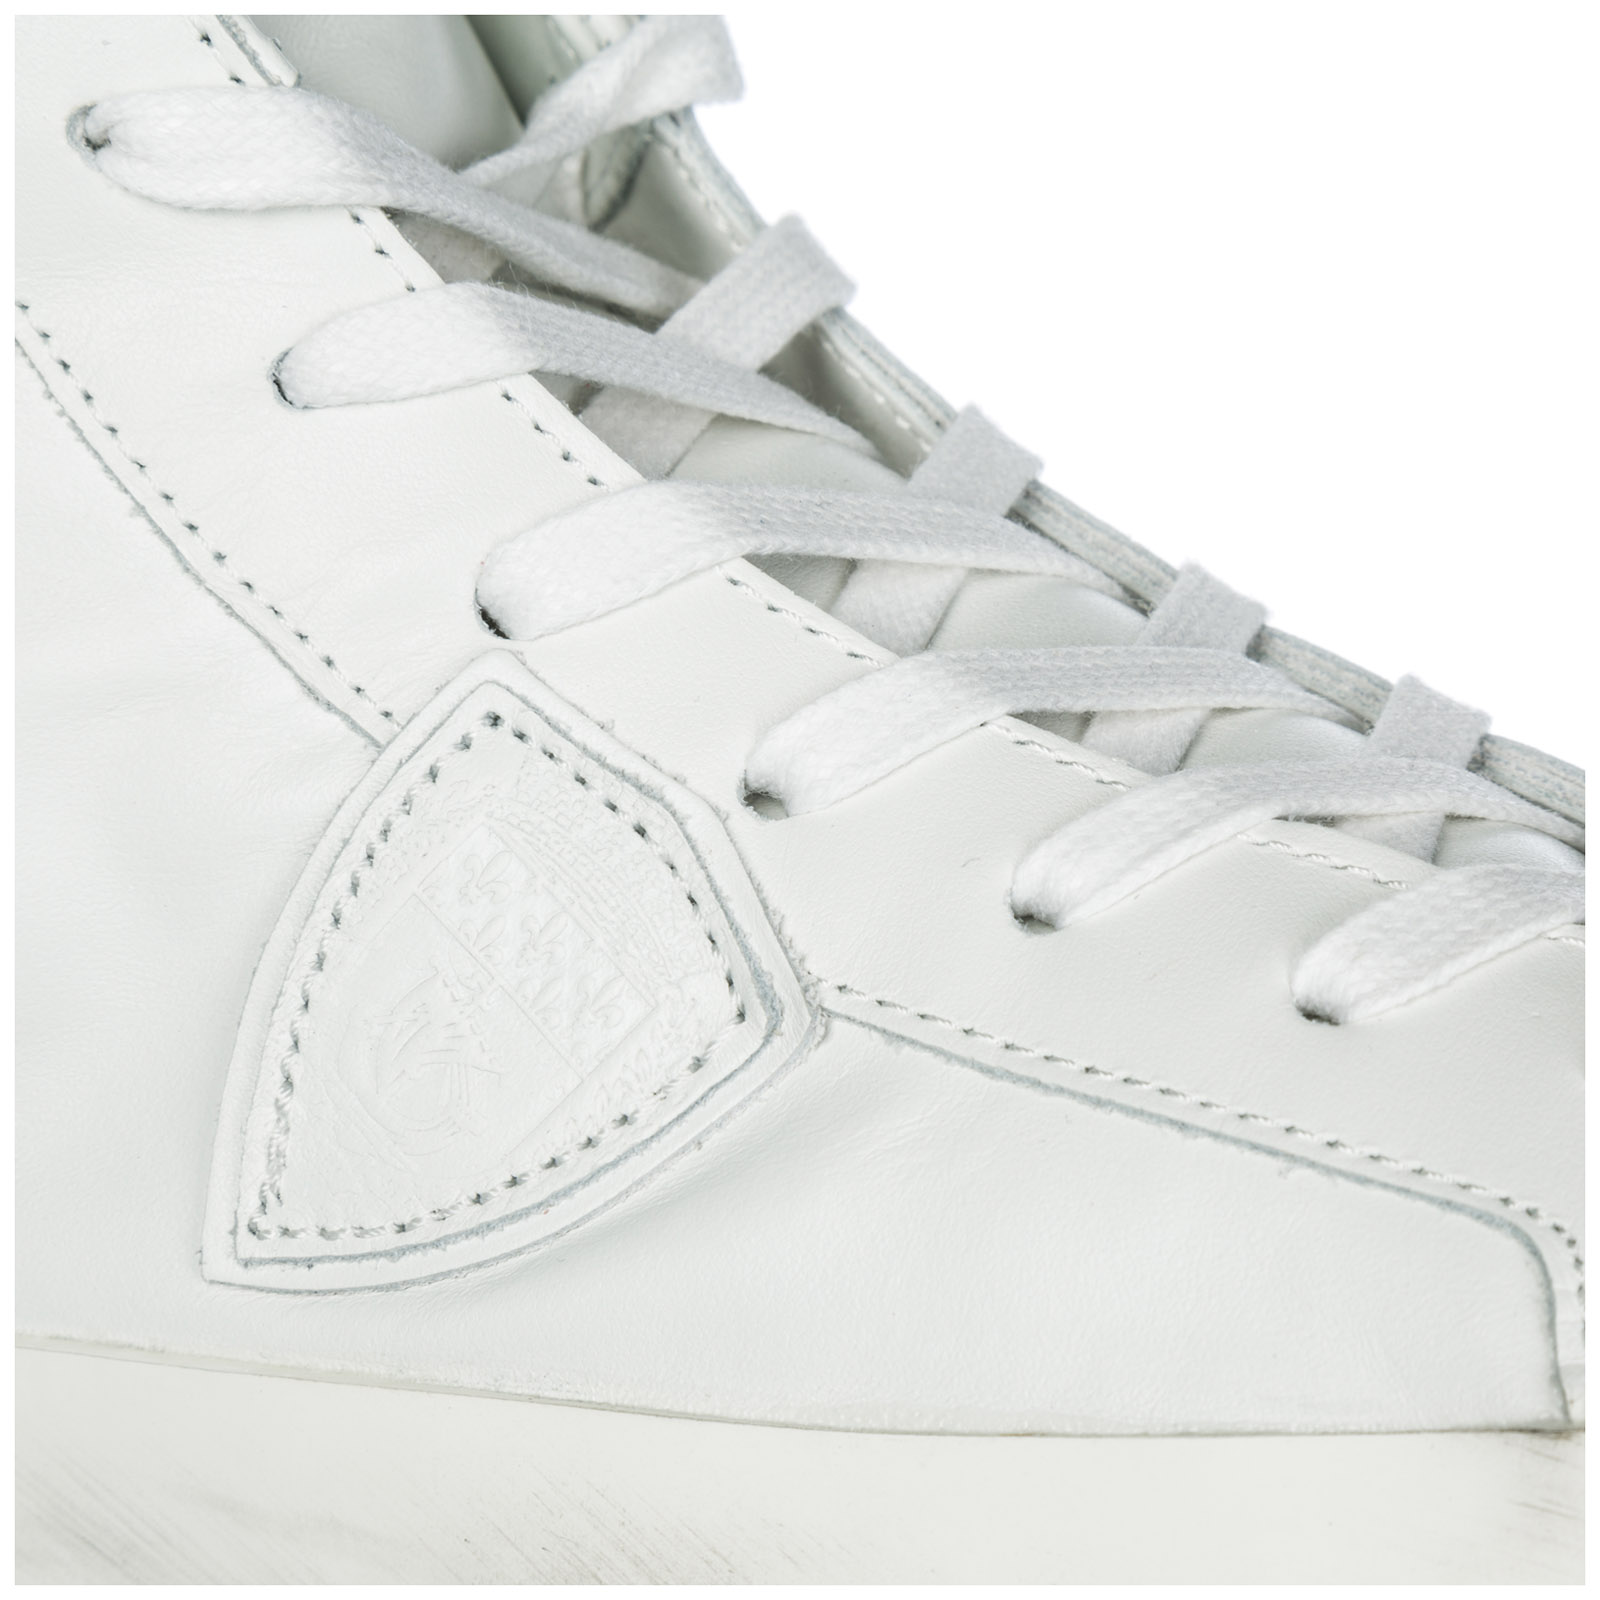 Uomo Paris In Pelle Sneakers Scarpe Alte 7vYbgf6y